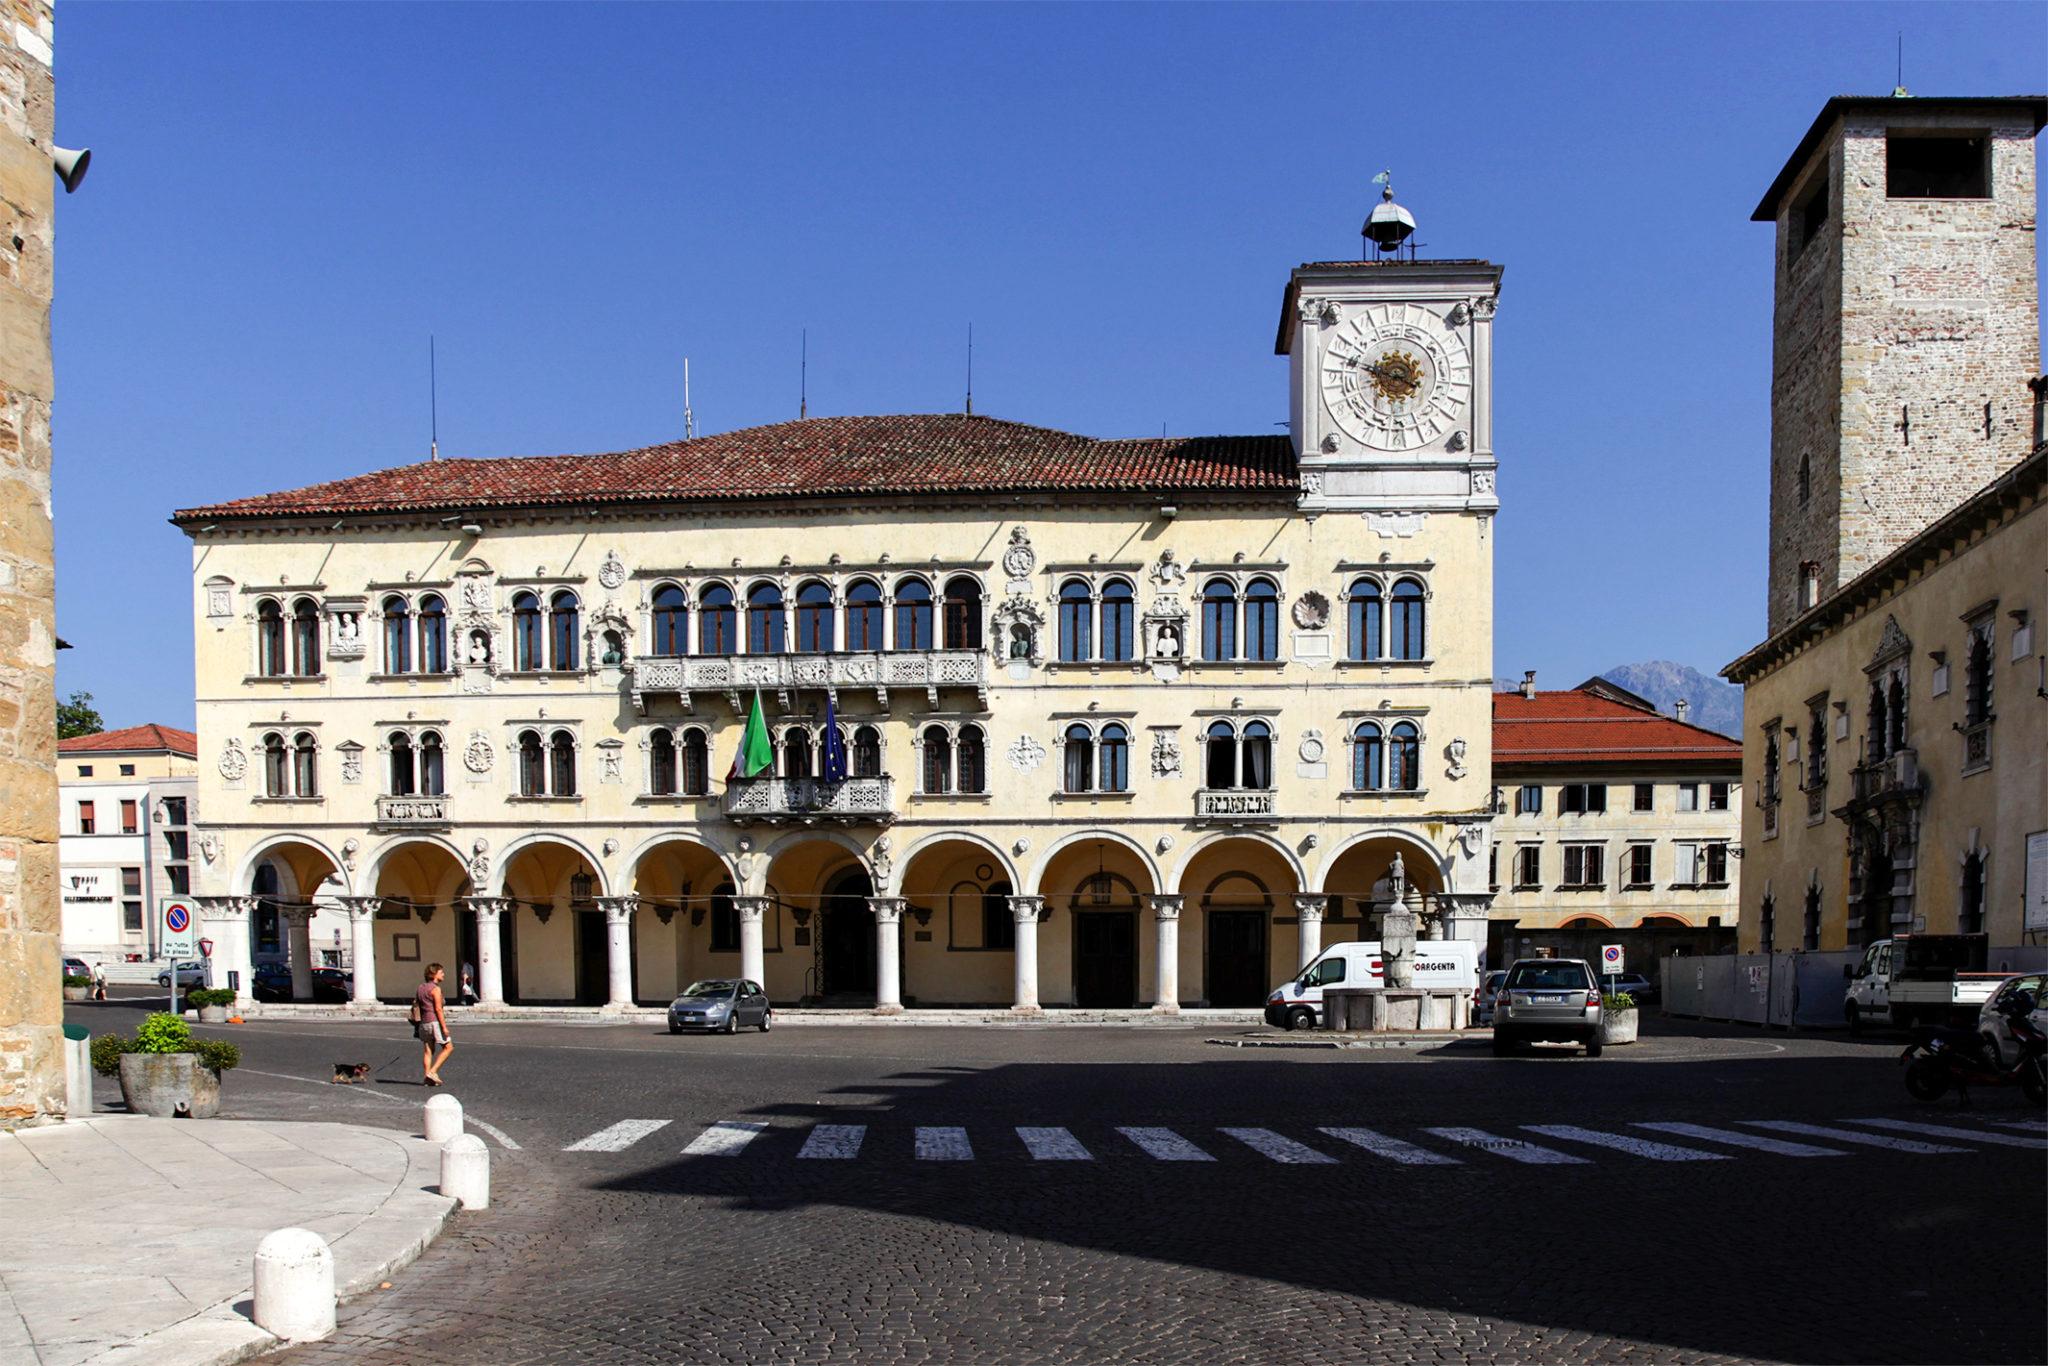 Belluno, dolomiti, italia, italy, duomo, Palais, Dolomites, Dolomiten